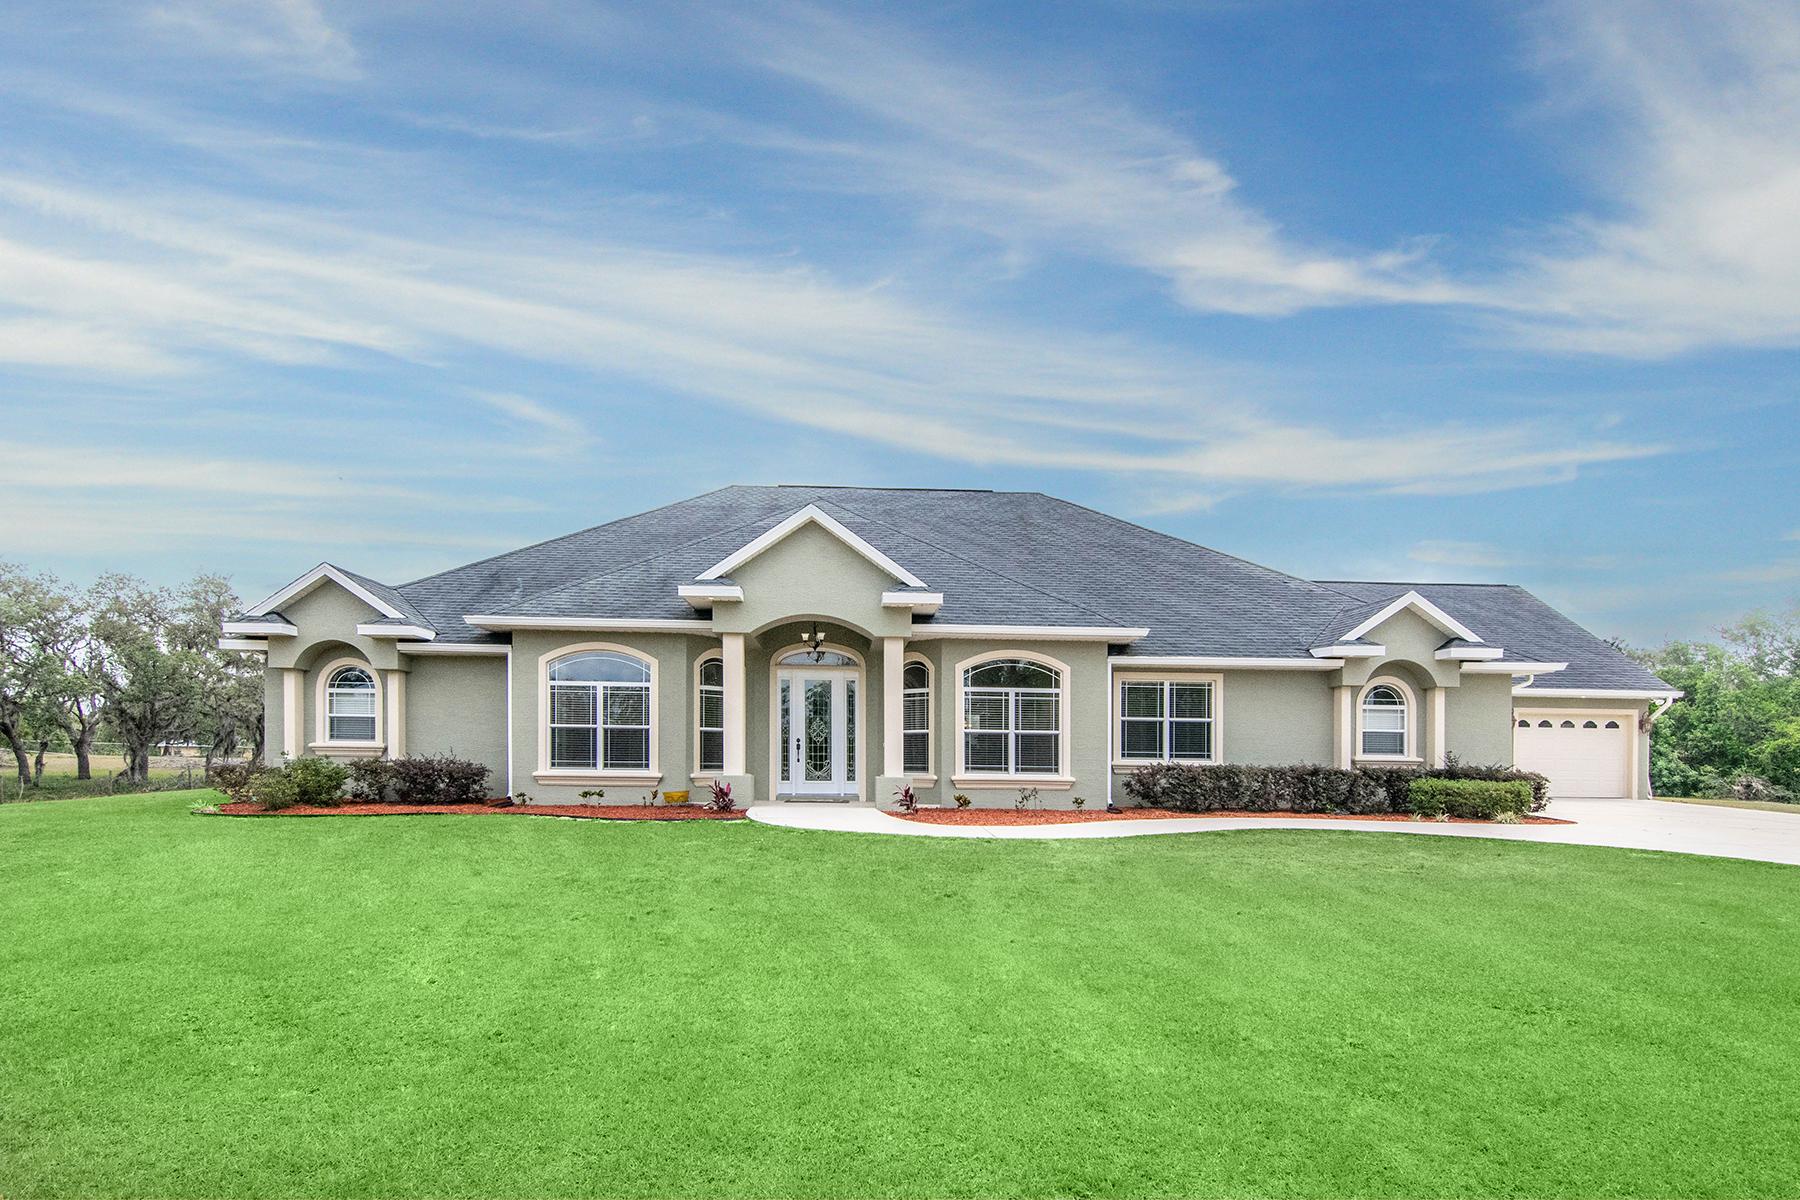 Single Family Home for Sale at SEBRING 110 Mini Ranch Rd Sebring, Florida 33870 United States